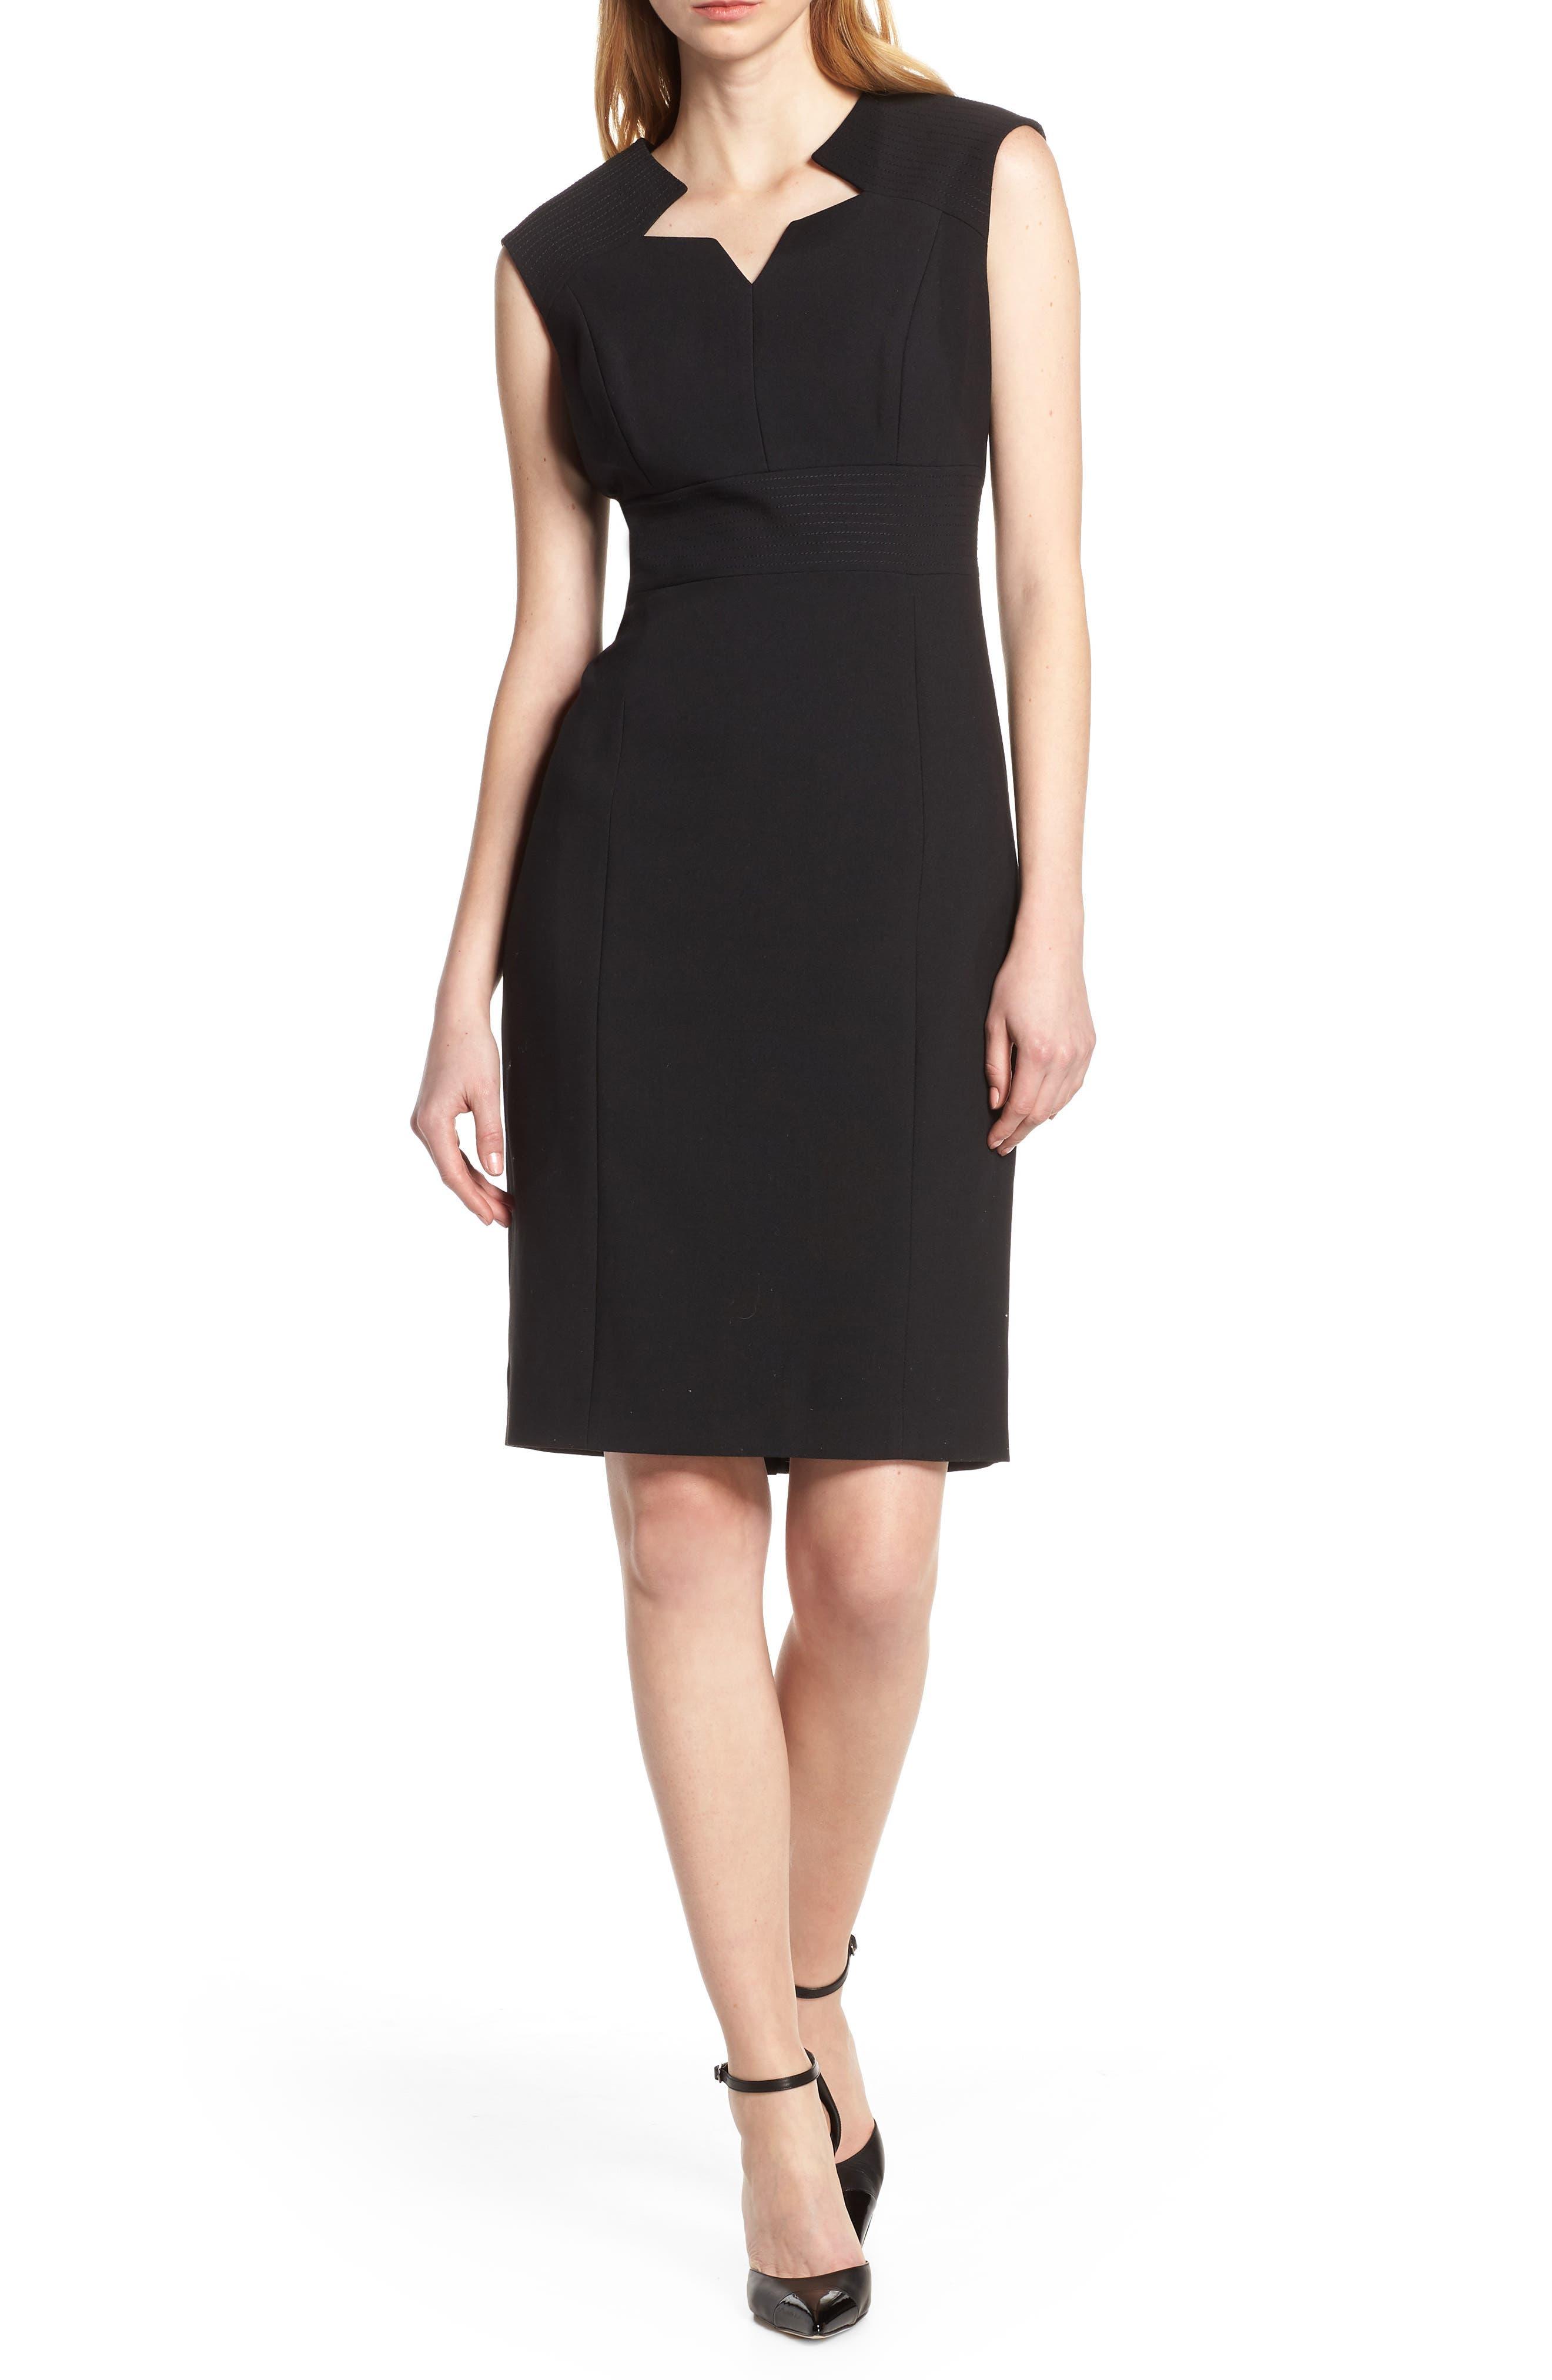 TAHARI Star Neckline Crepe Sheath Dress, Main, color, BLACK